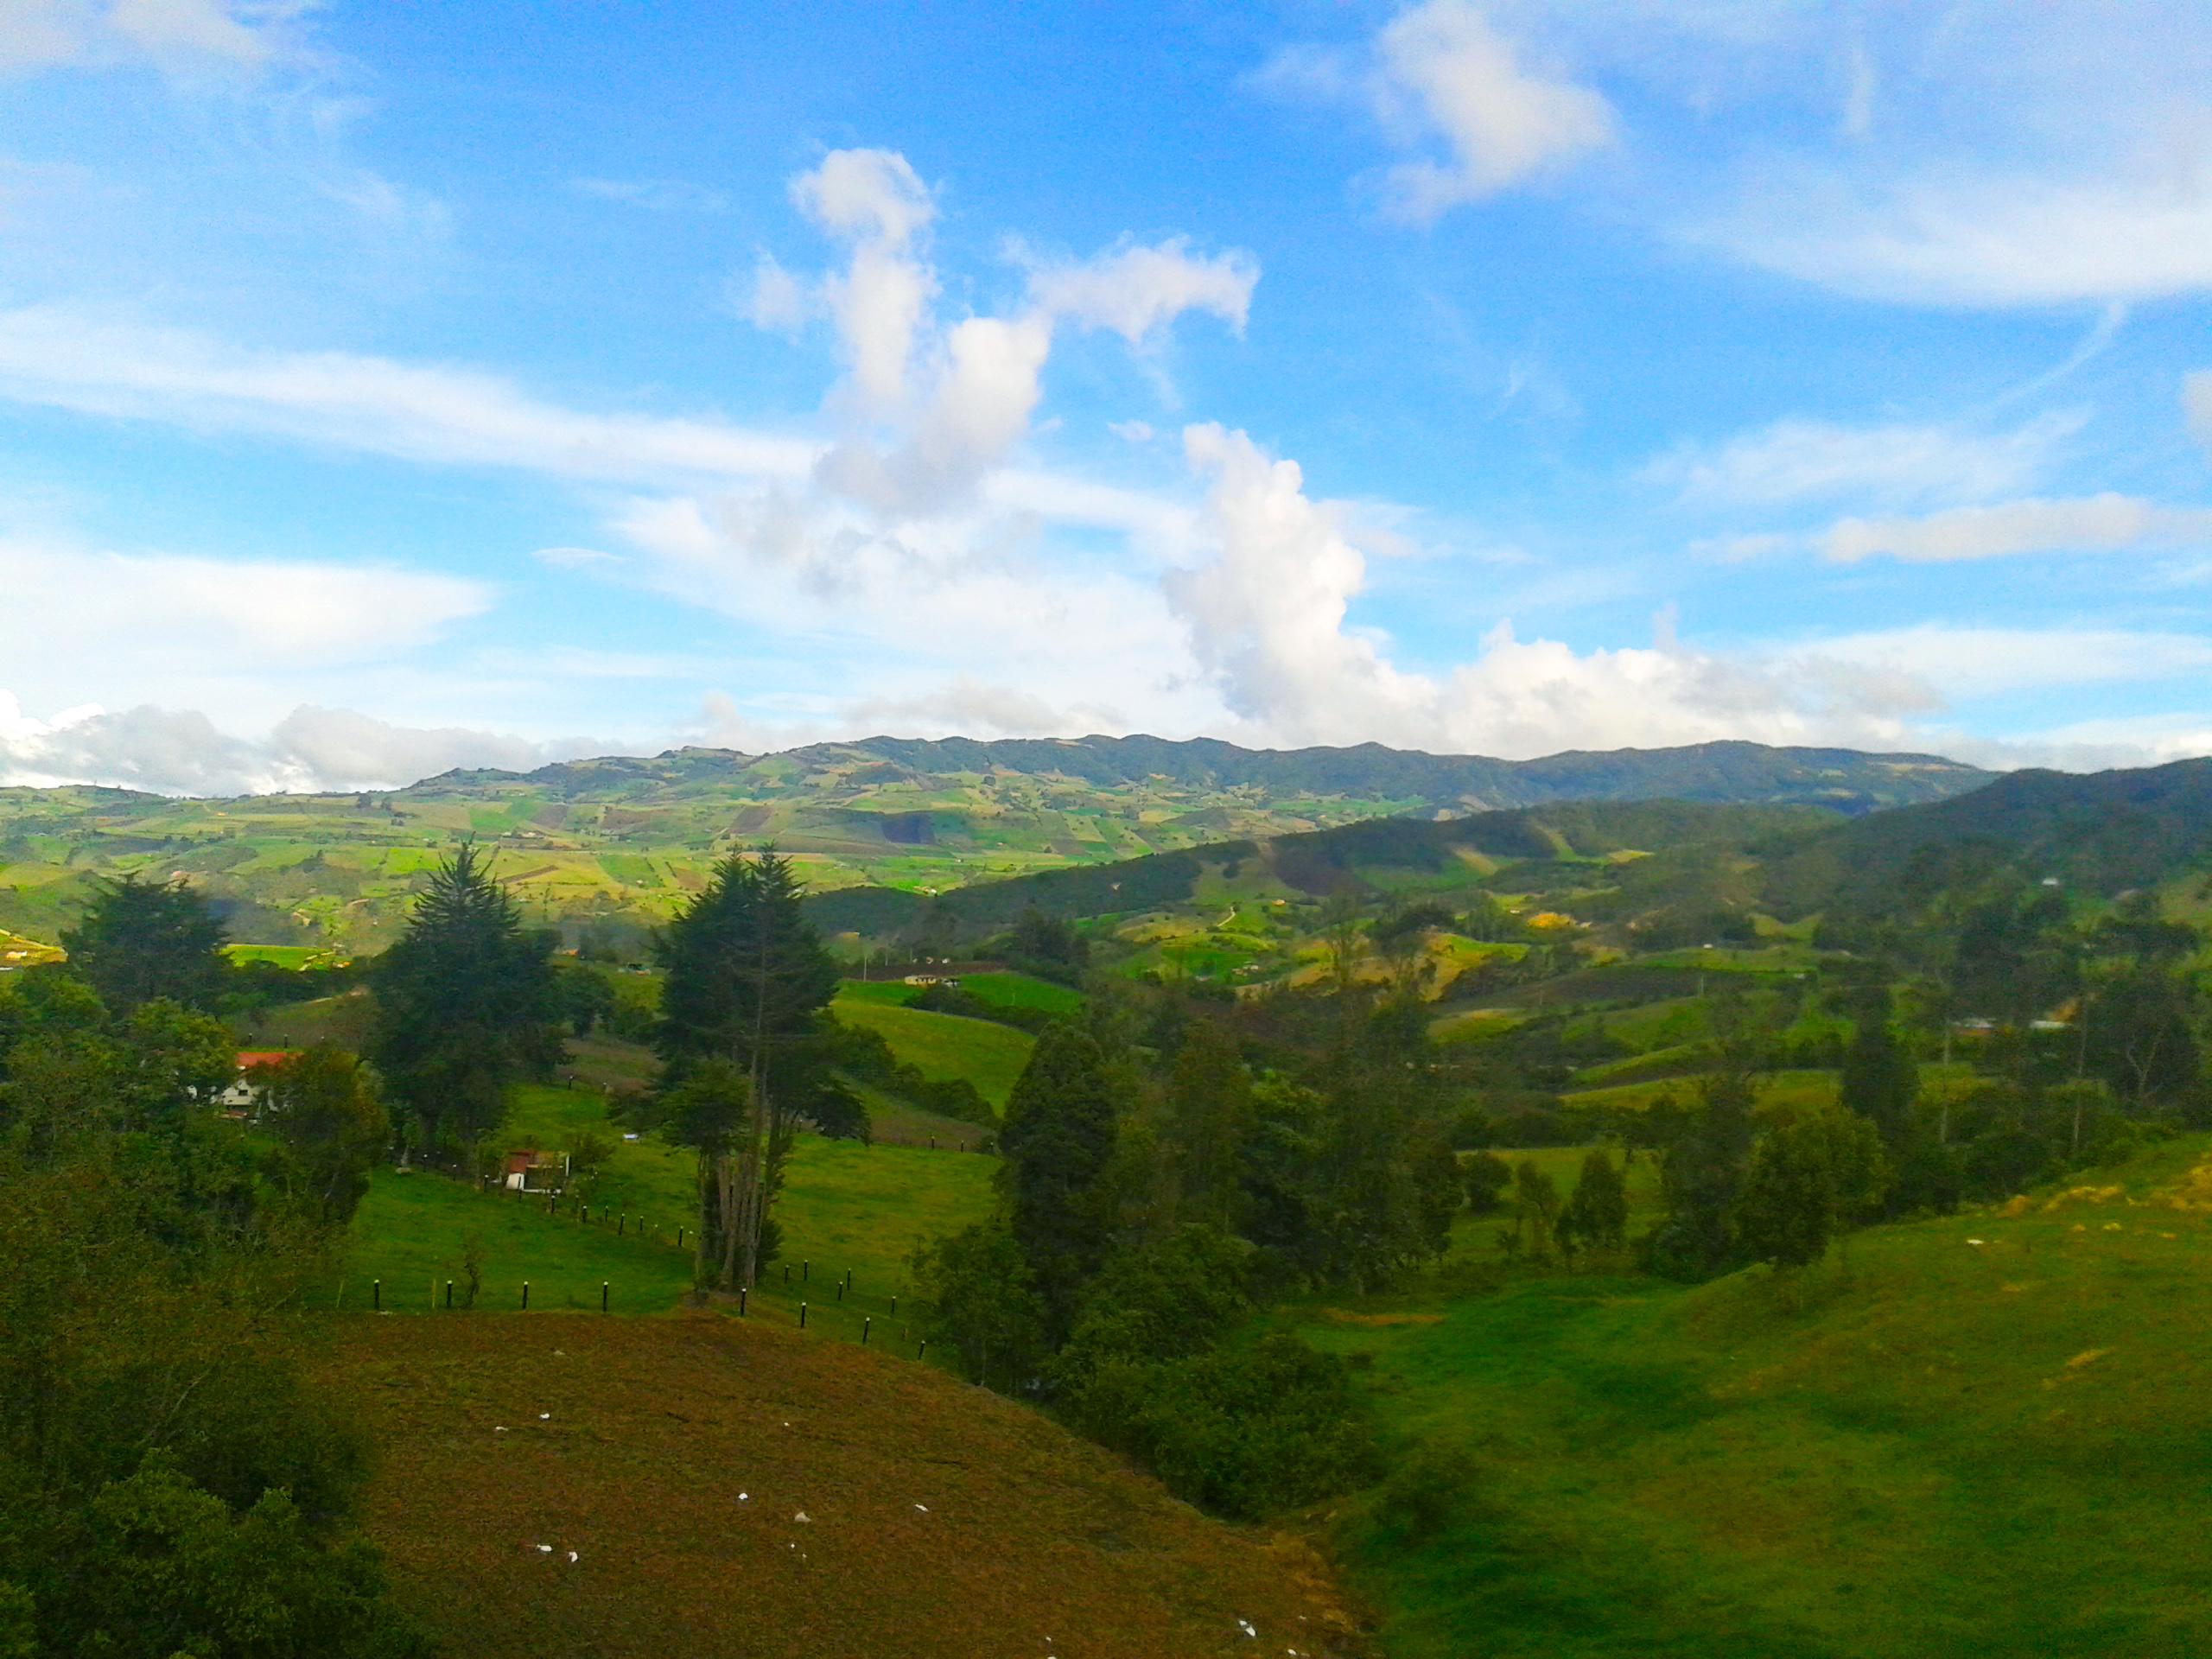 Colombia Cundinamarca Boyaca.jpg